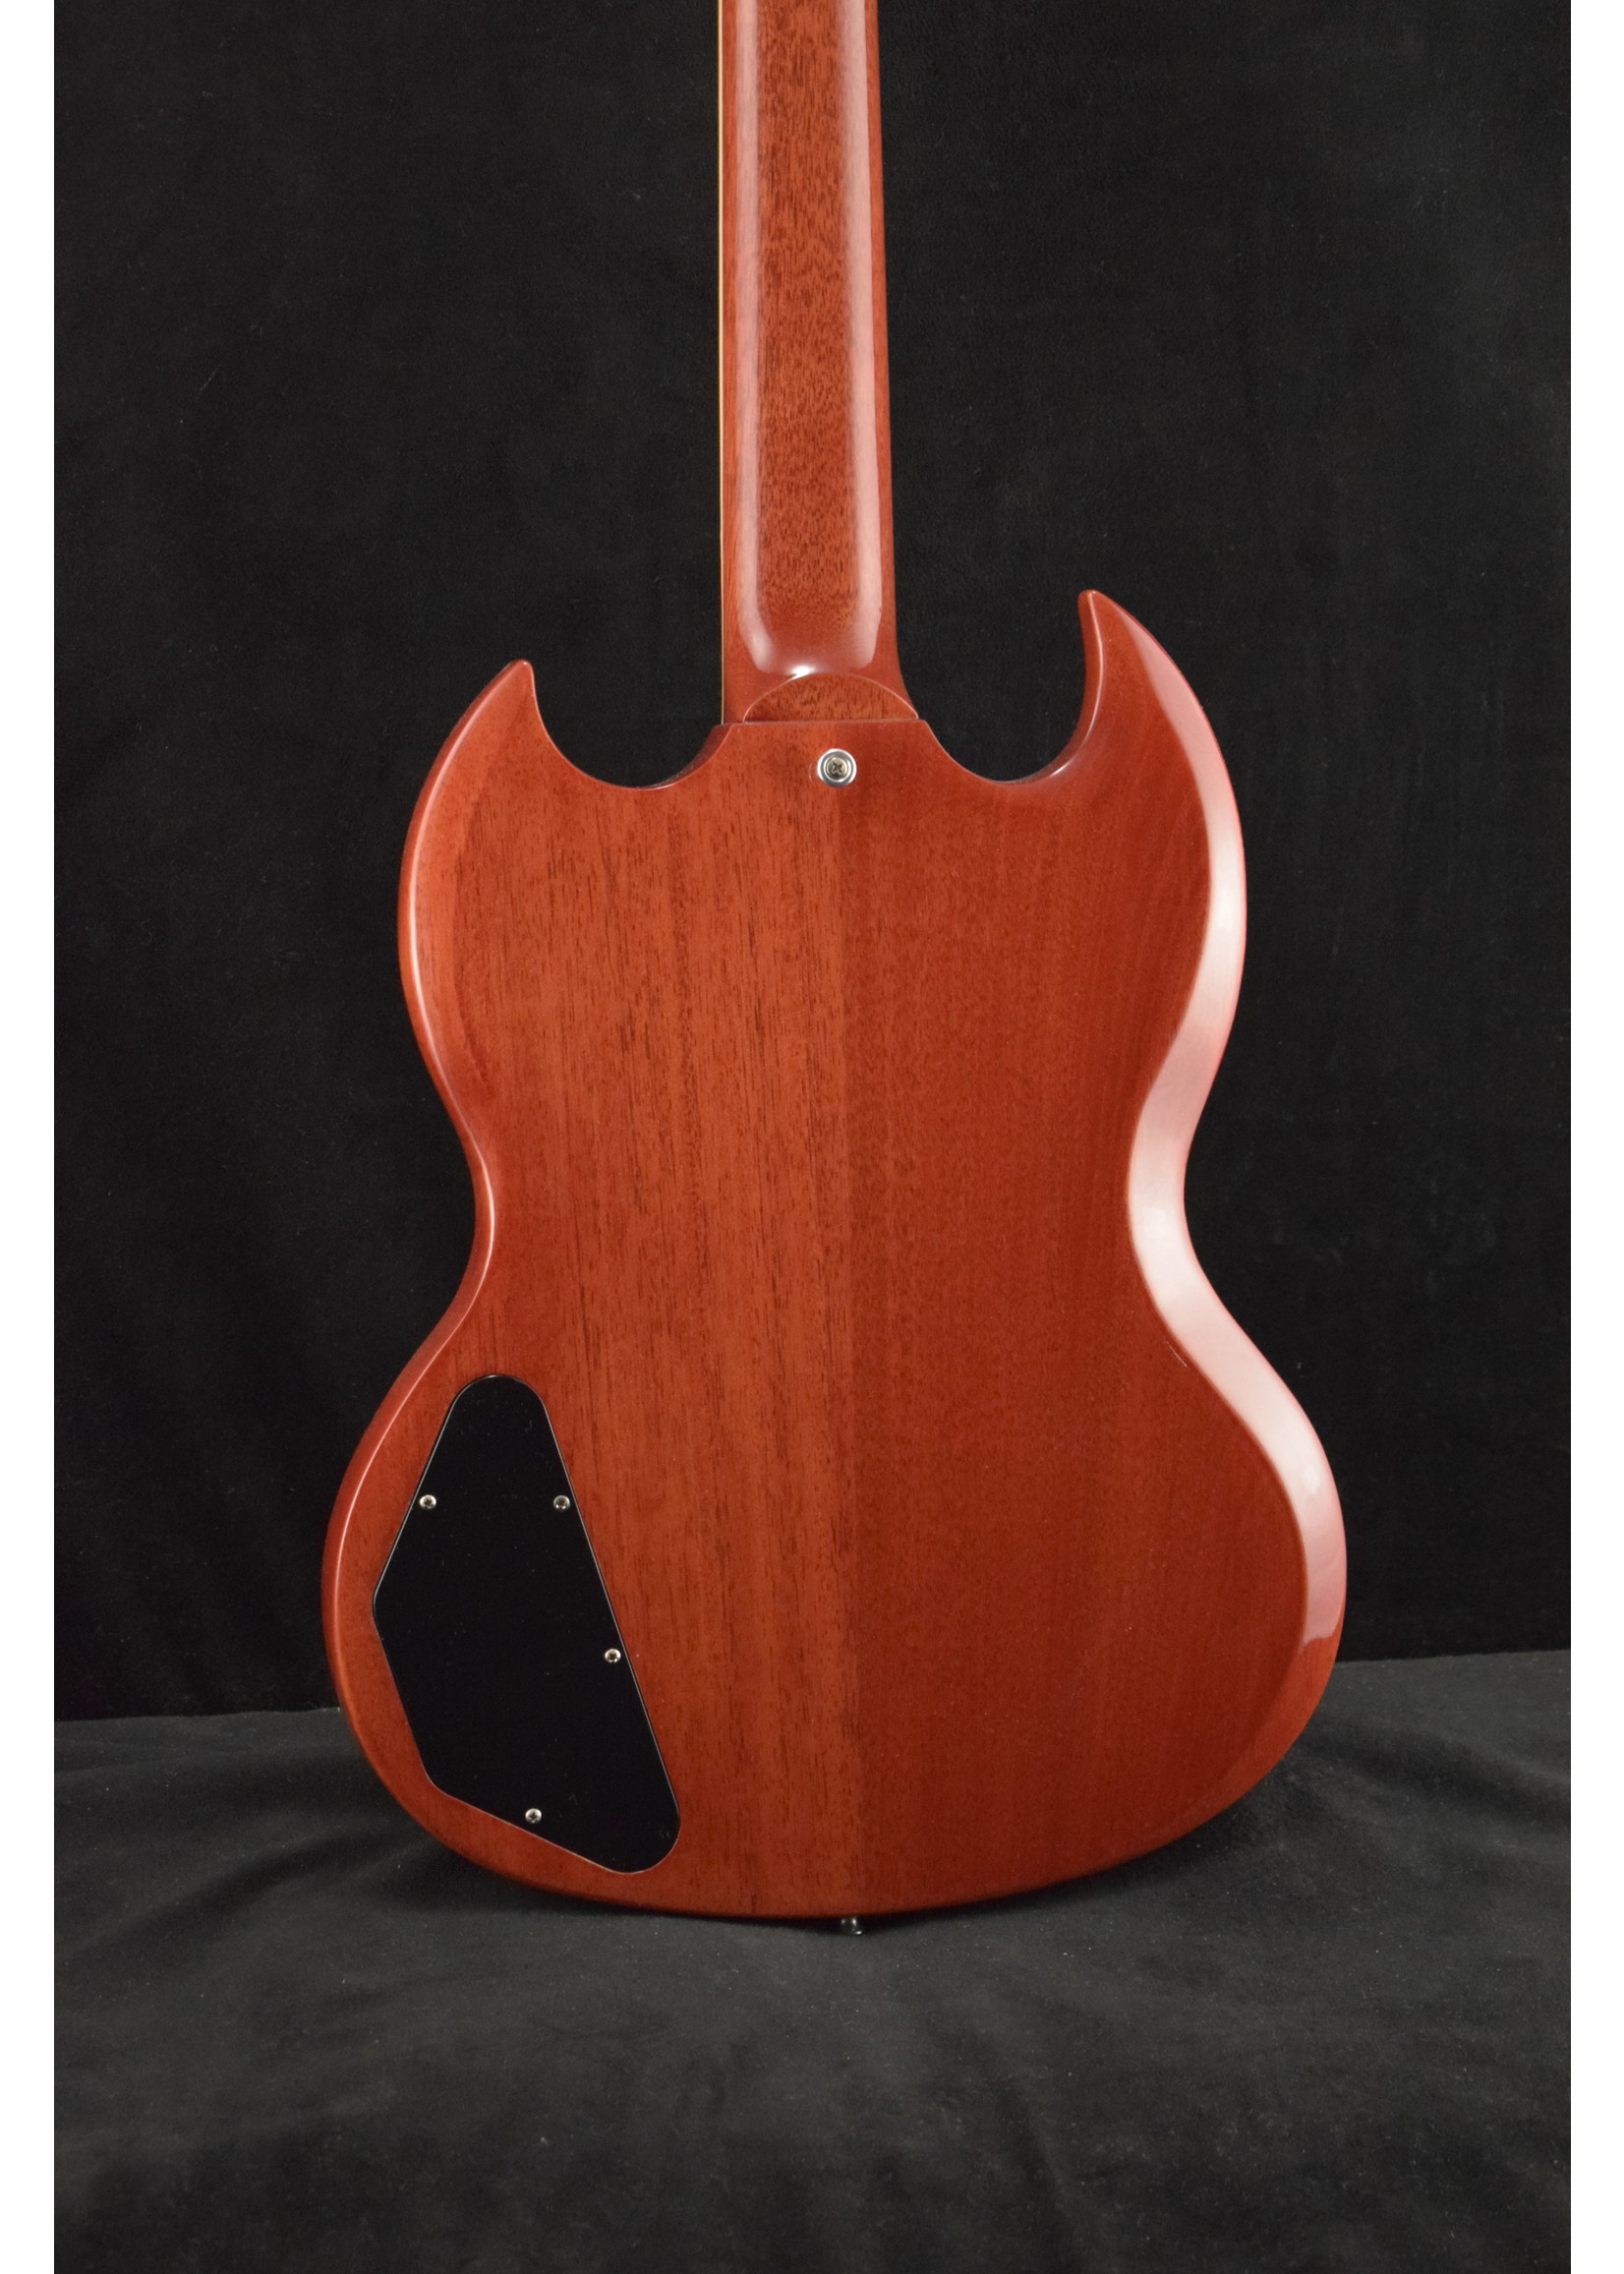 Gibson Gibson SG Standard '61 Maestro Vibrola Vintage Cherry